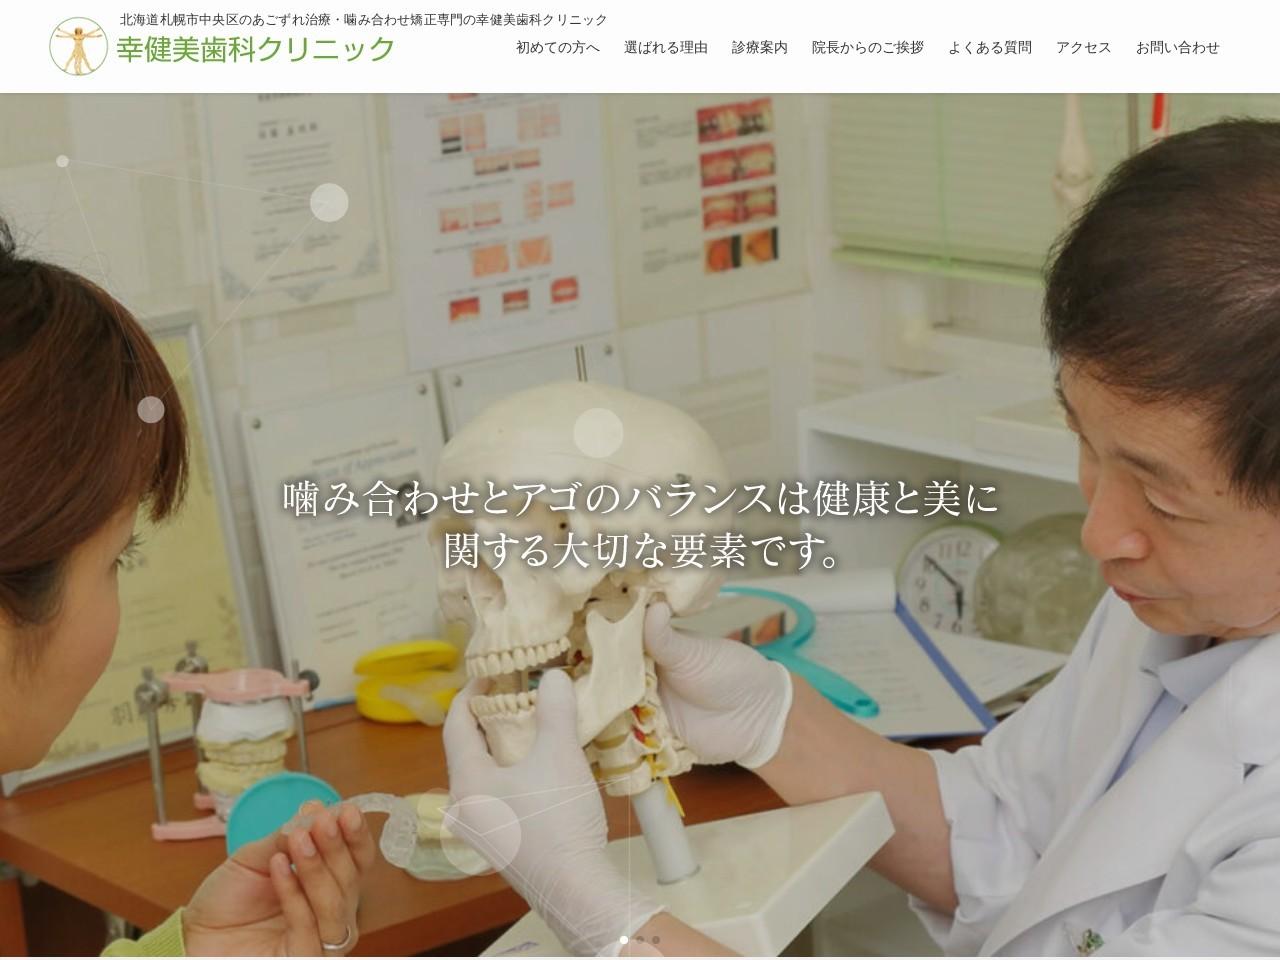 幸健美歯科クリニック (北海道札幌市中央区)